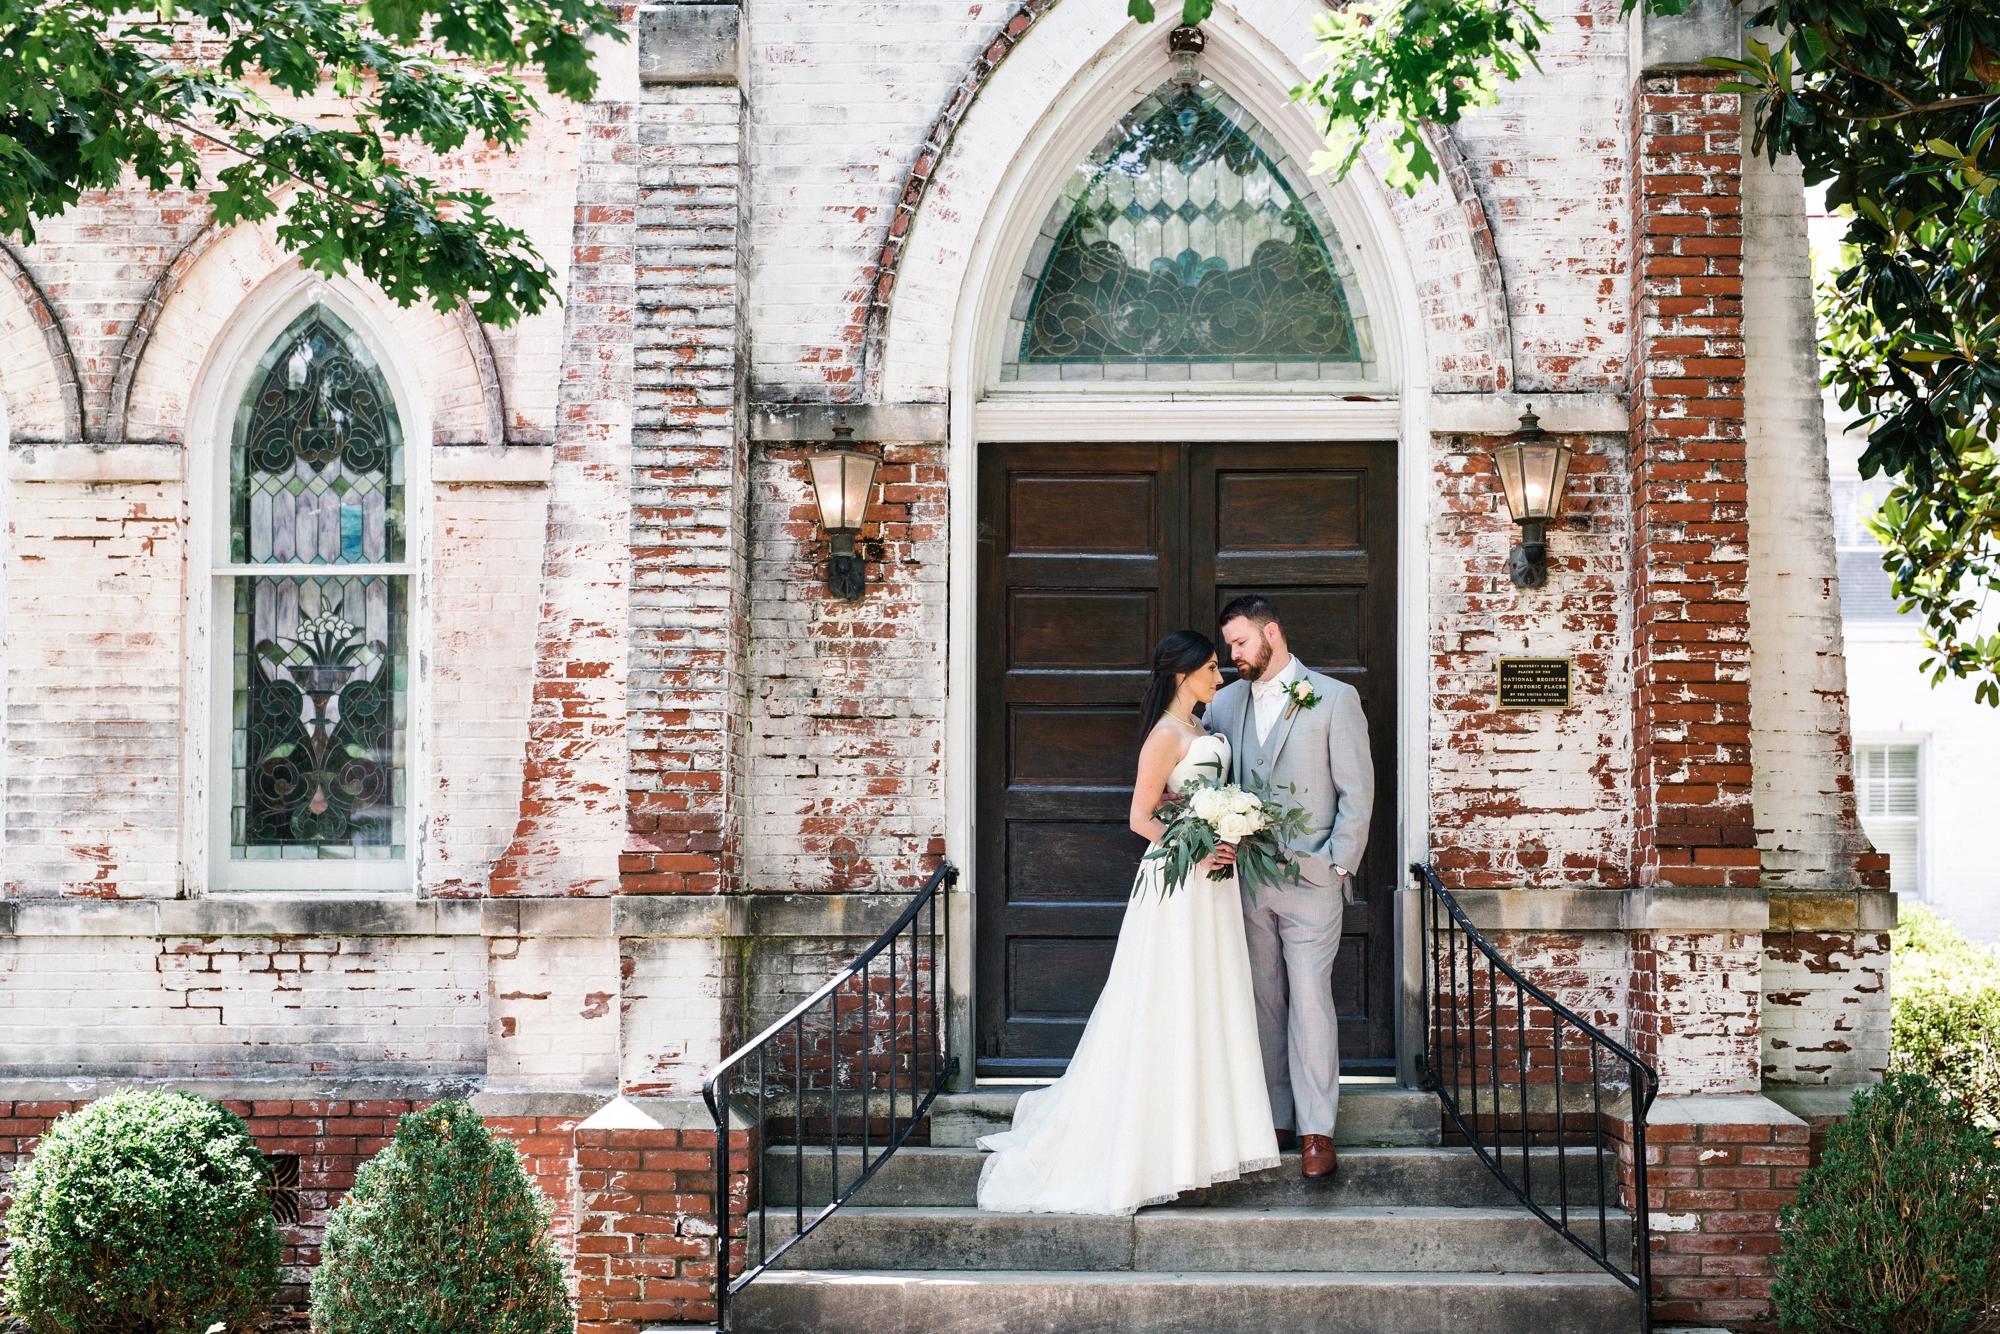 New_Orleans_Wedding_Photographer_1337.jpg